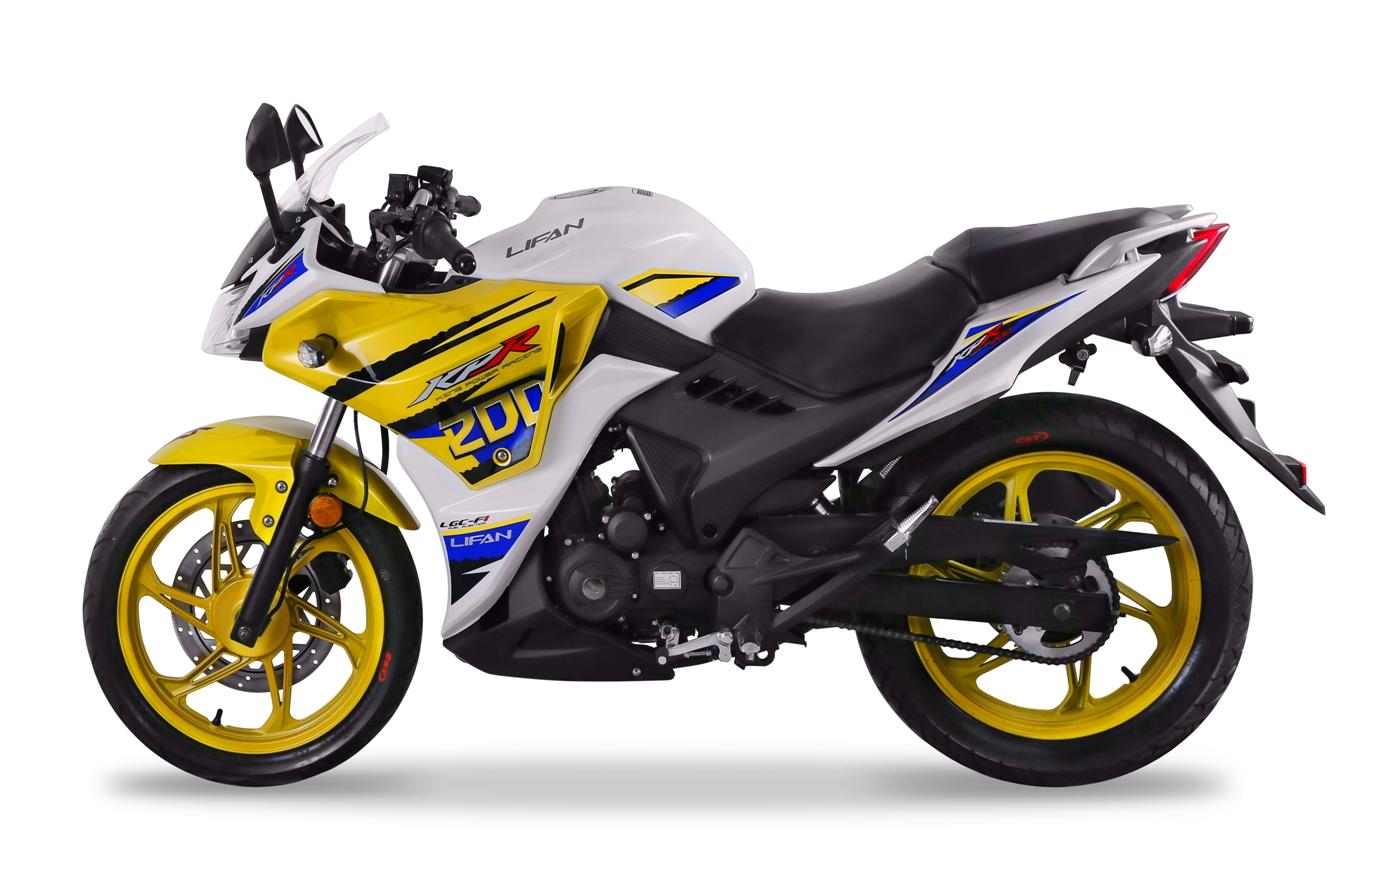 МОТОЦИКЛ LIFAN LF200-10S (KPR) TEAM EDITION  Артмото - купить квадроцикл в украине и харькове, мотоцикл, снегоход, скутер, мопед, электромобиль